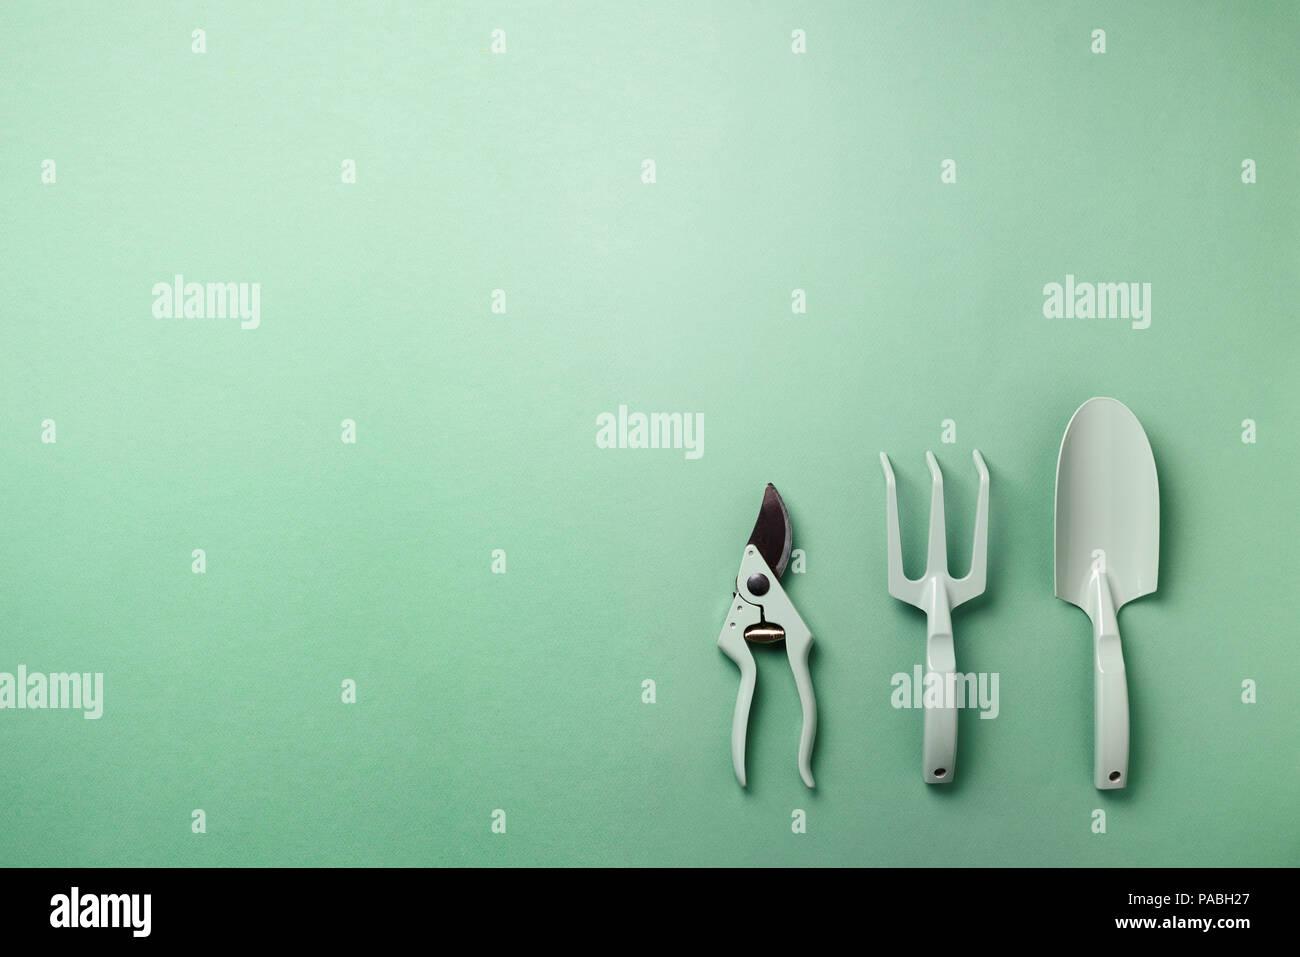 Farming Utensils Stock Photos & Farming Utensils Stock Images - Alamy